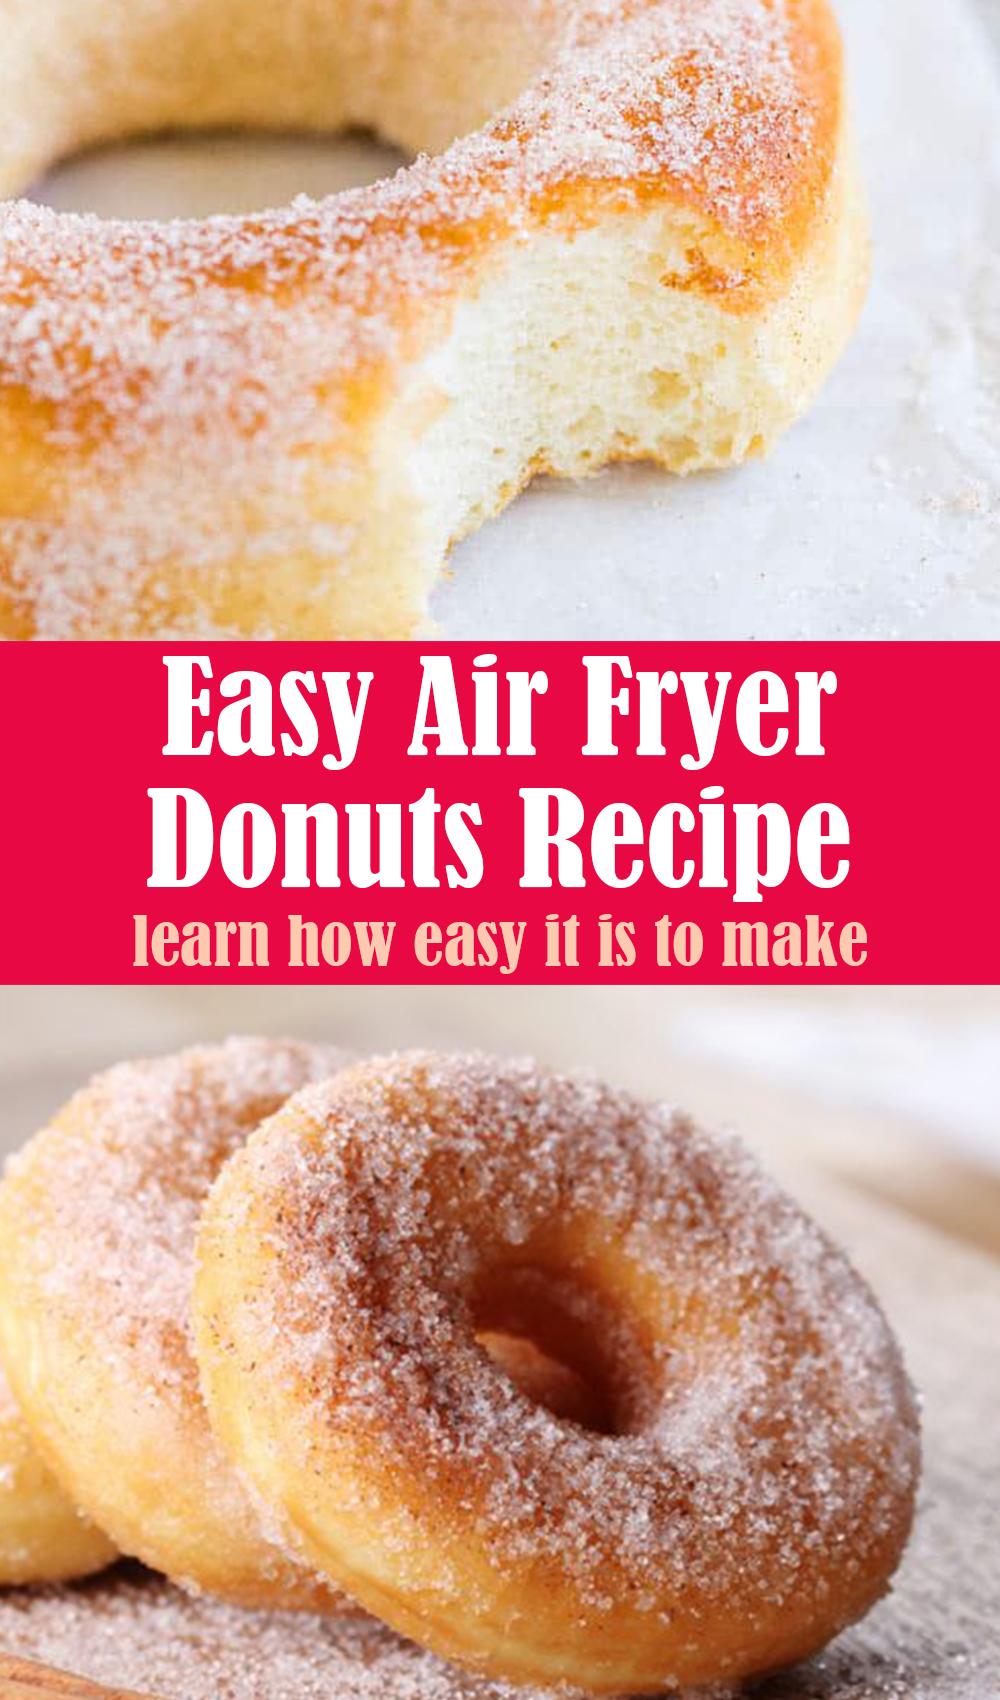 Easy Air Fryer Donuts Recipe